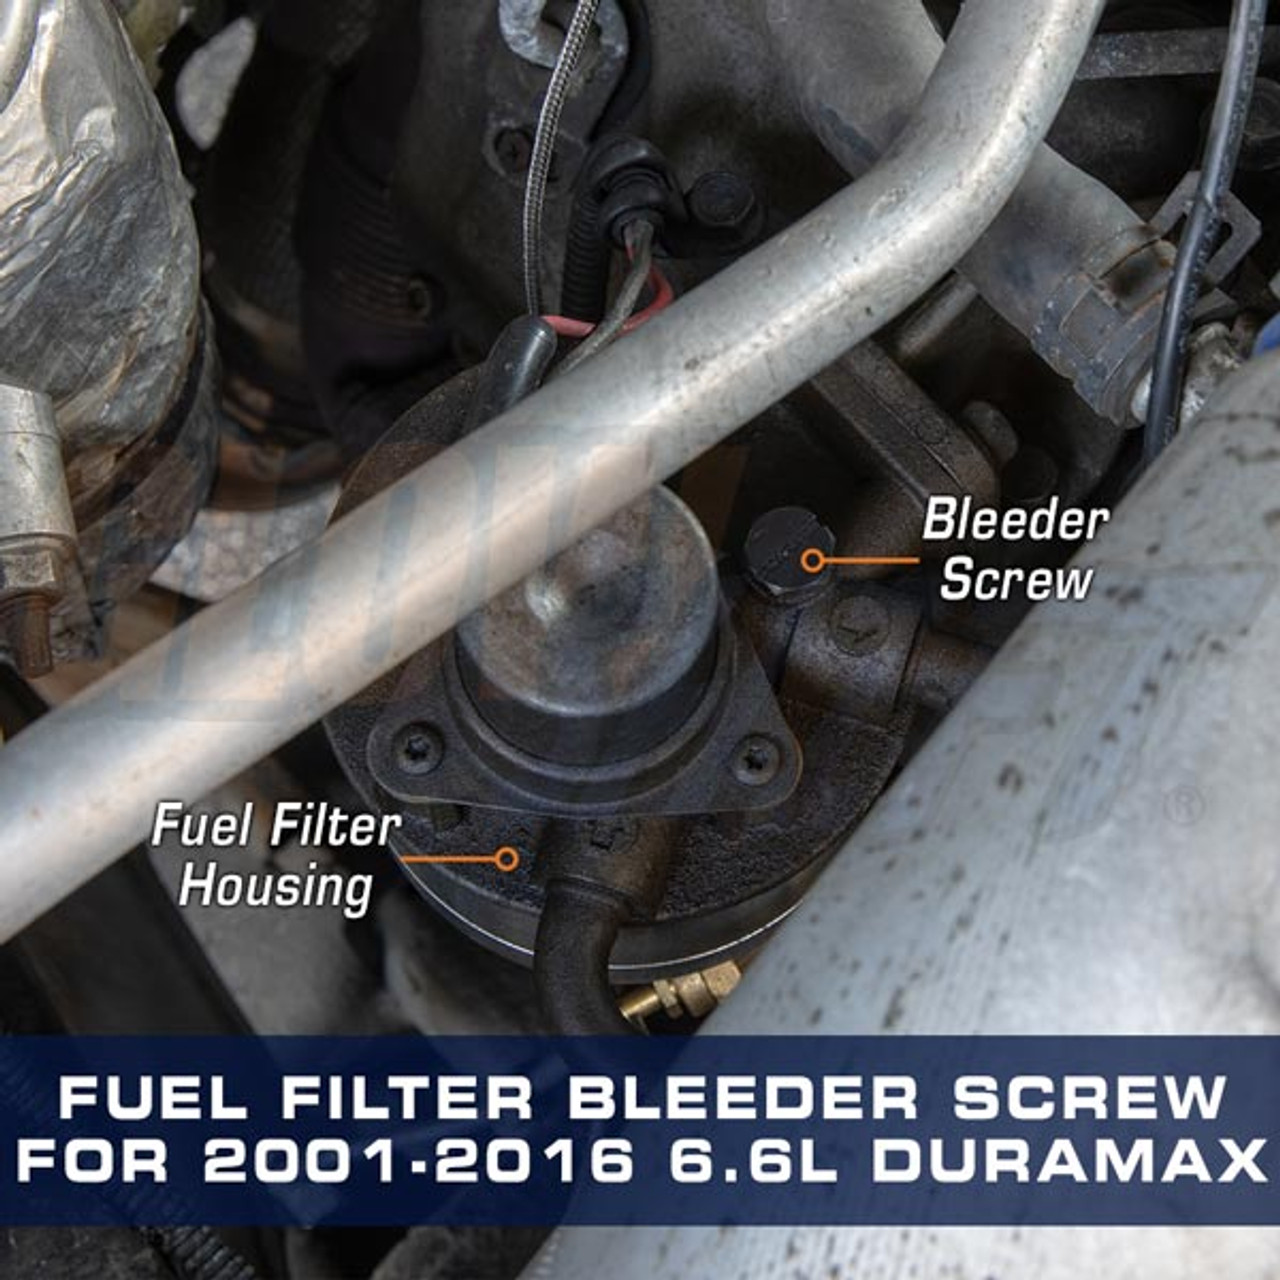 [NRIO_4796]   GlowShift | Fuel Filter Bleeder Screw for GM 6.6L Duramax | 2007 Yukon Fuel Filter |  | GlowShift